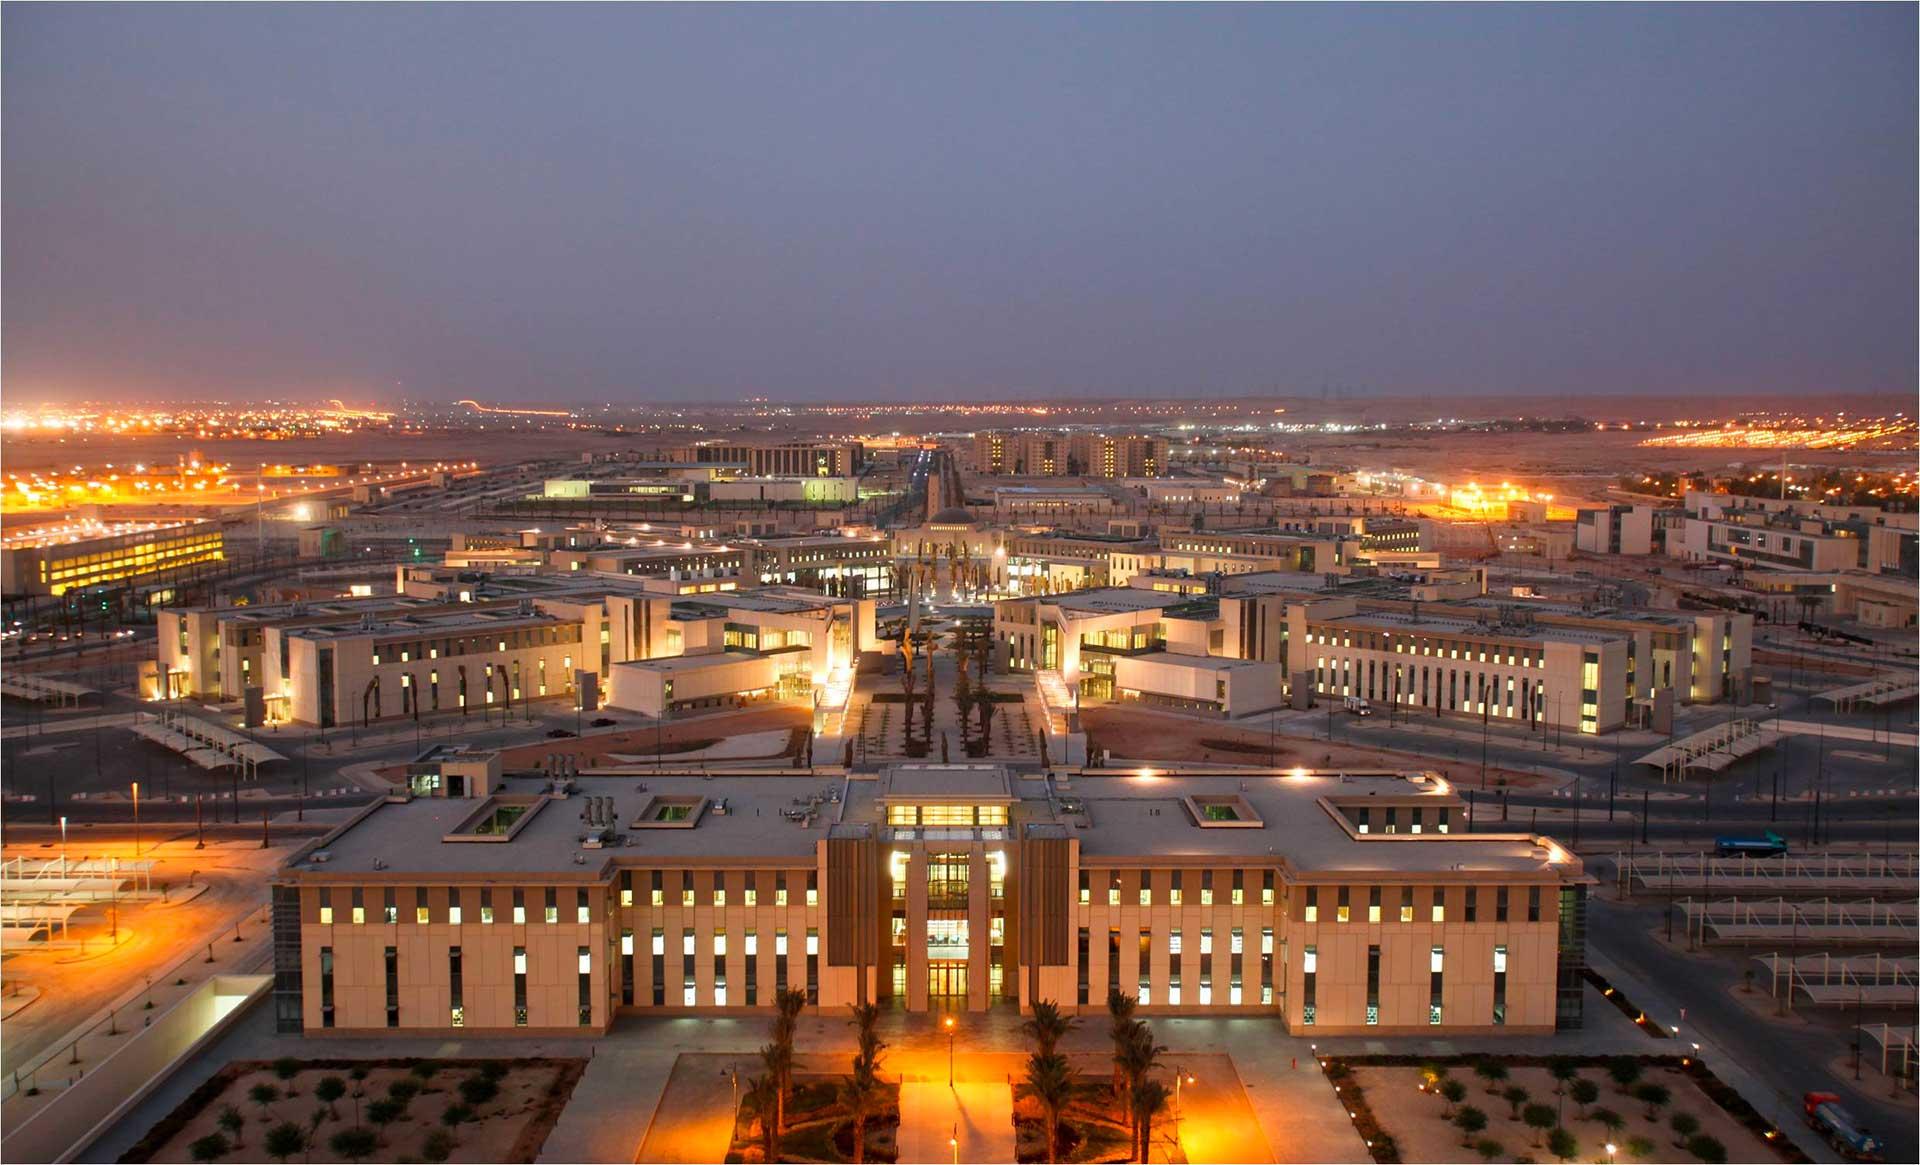 King Saud Bin Abdulaziz University Riyadh